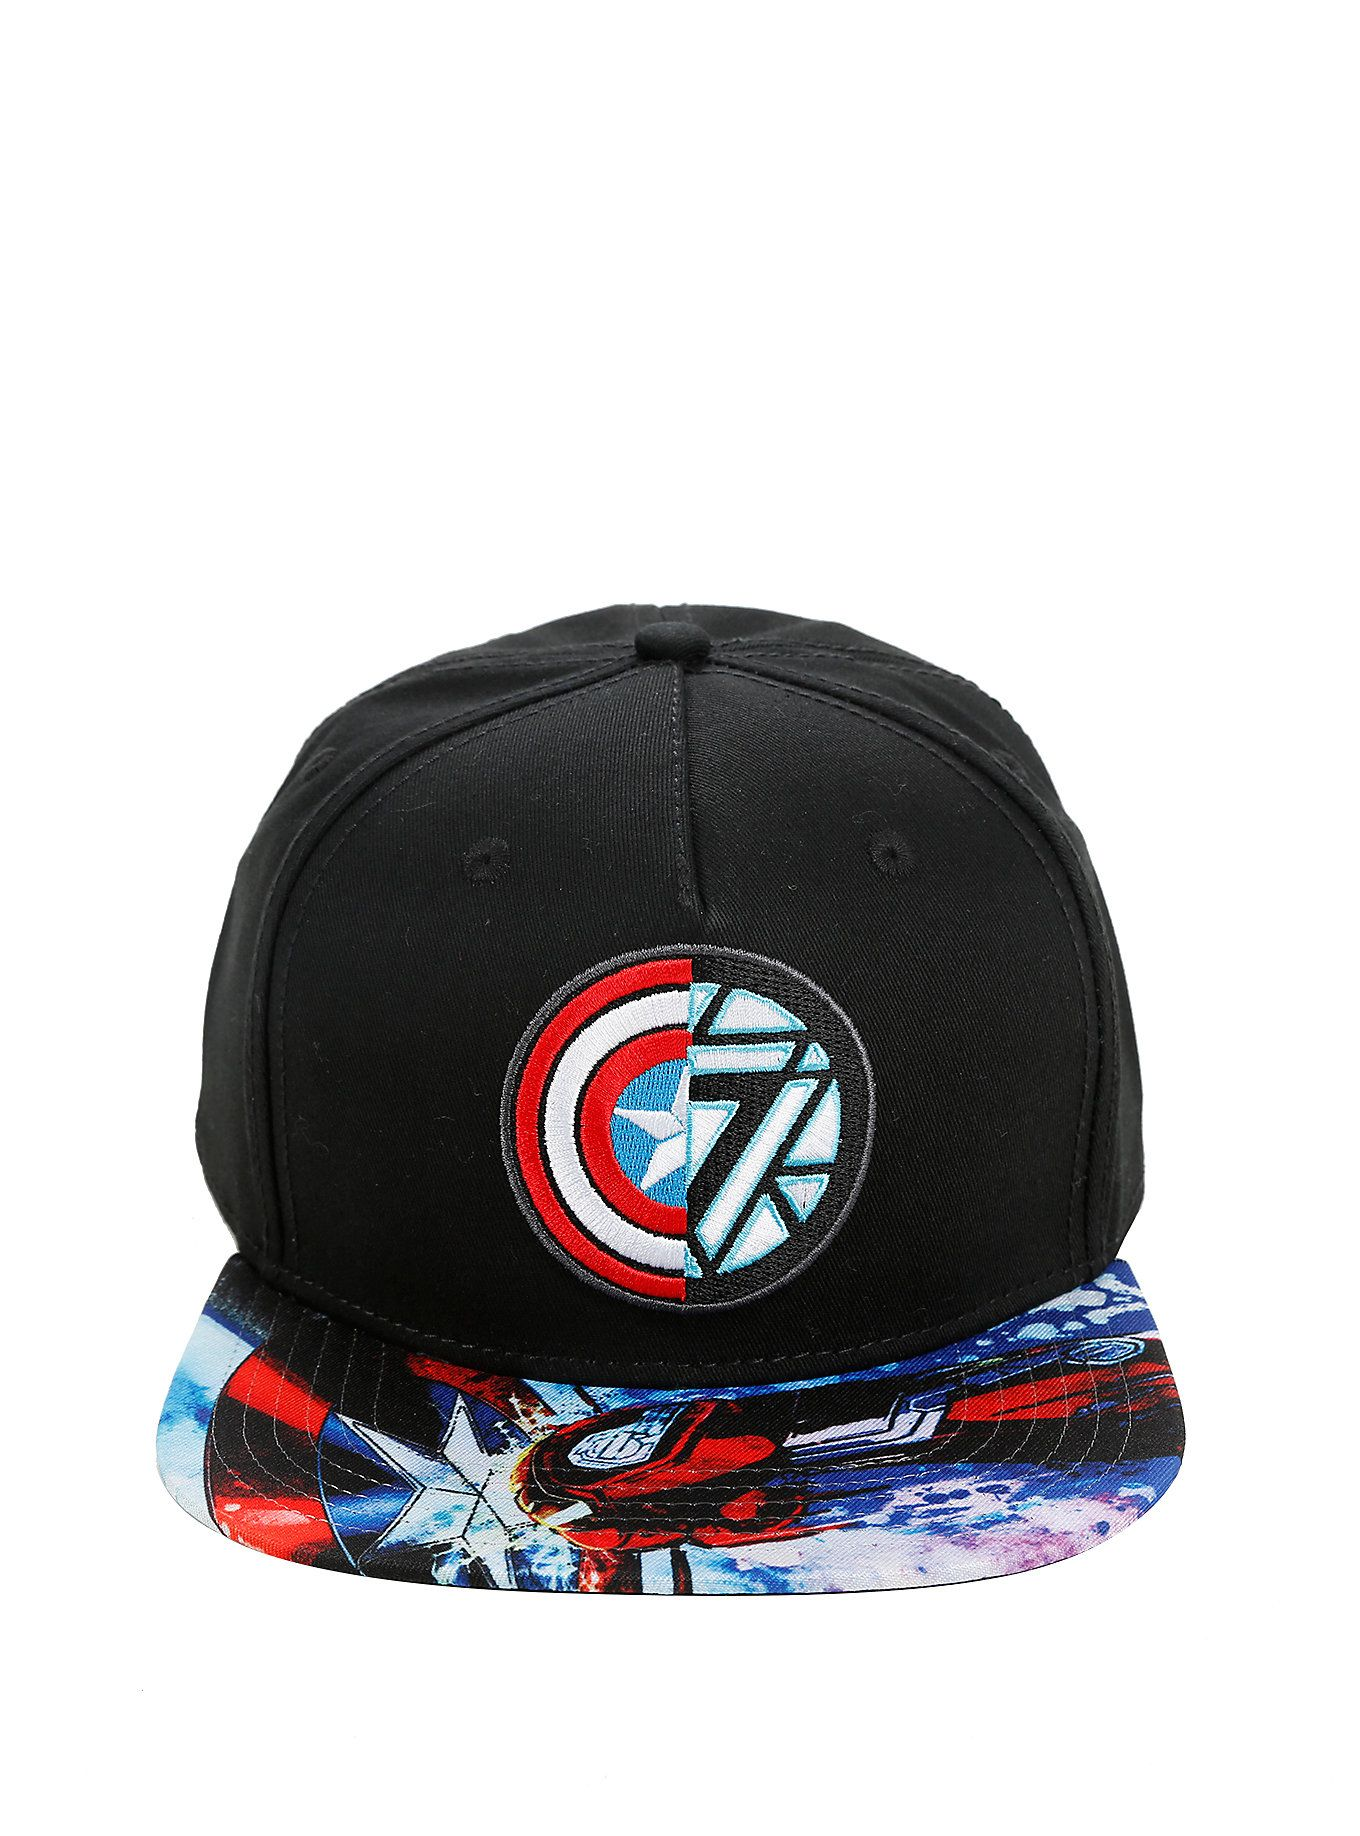 87844f3e37c3d Marvel Captain America  Civil War Captain America Vs Iron Man Logo Snapback  Hat